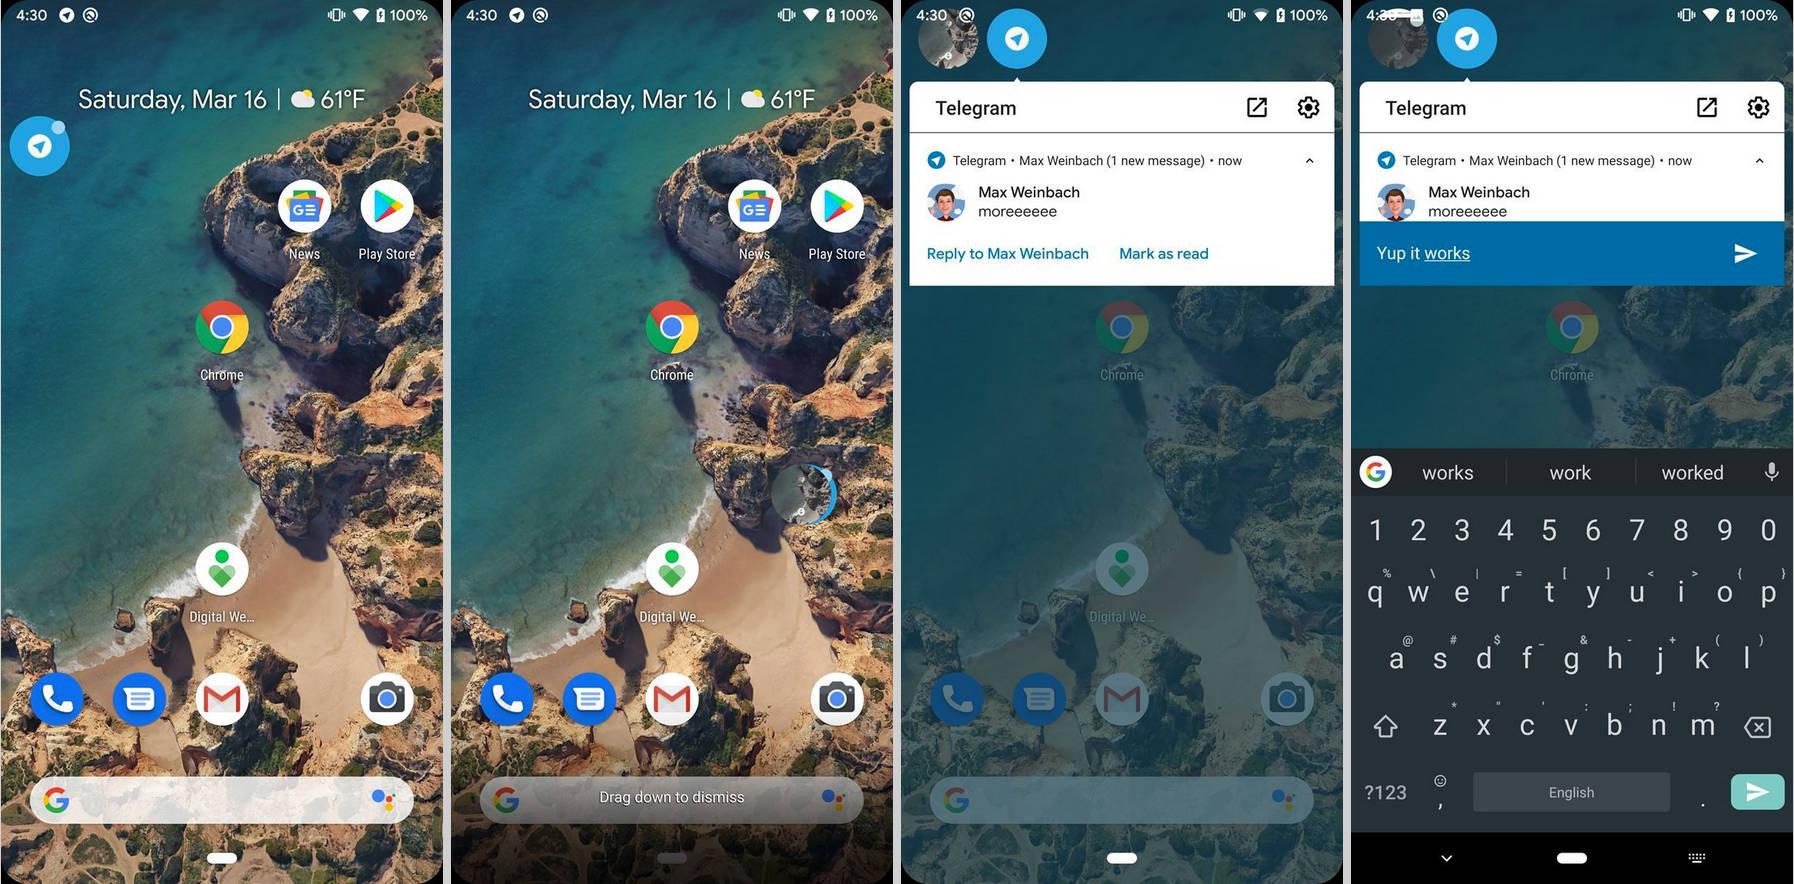 Android Q beta czaty powiadomienia Facebook Messenger